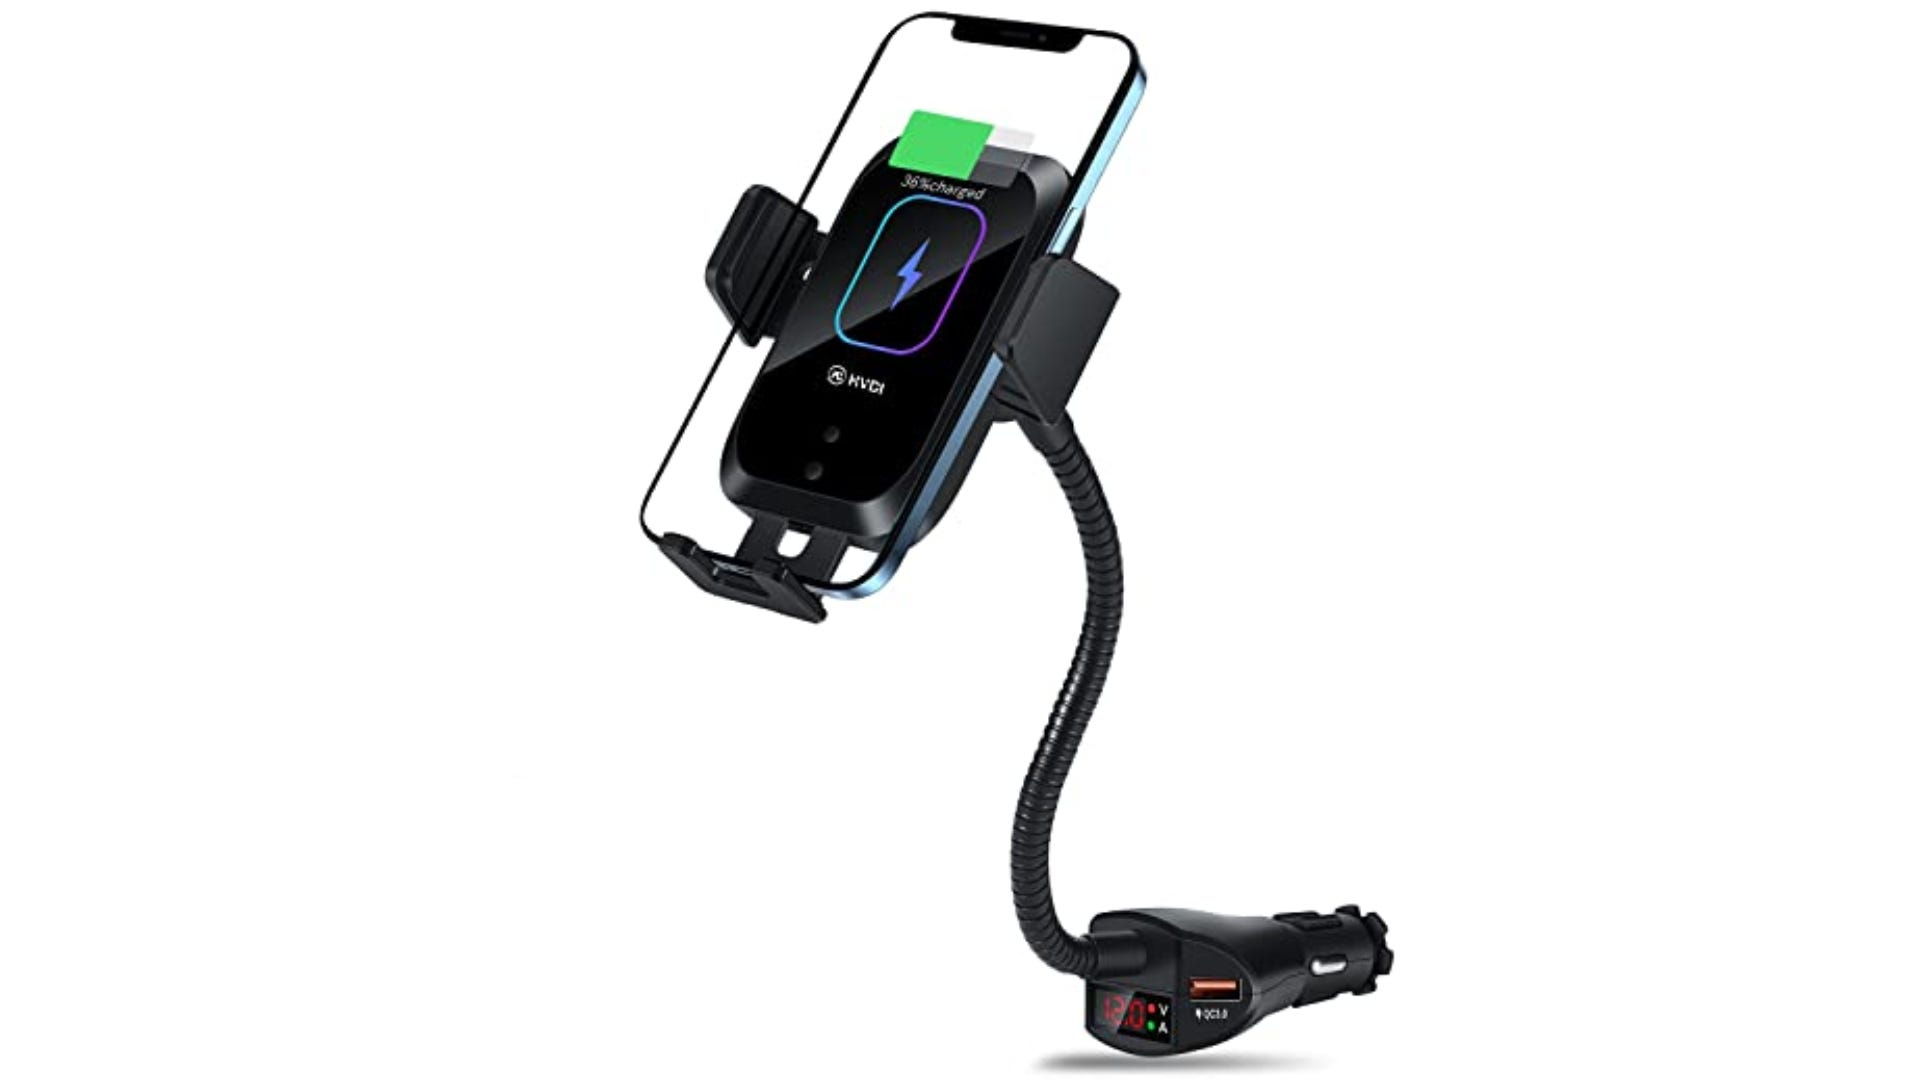 A cigarette holder charging car phone mount with a goose neck design.